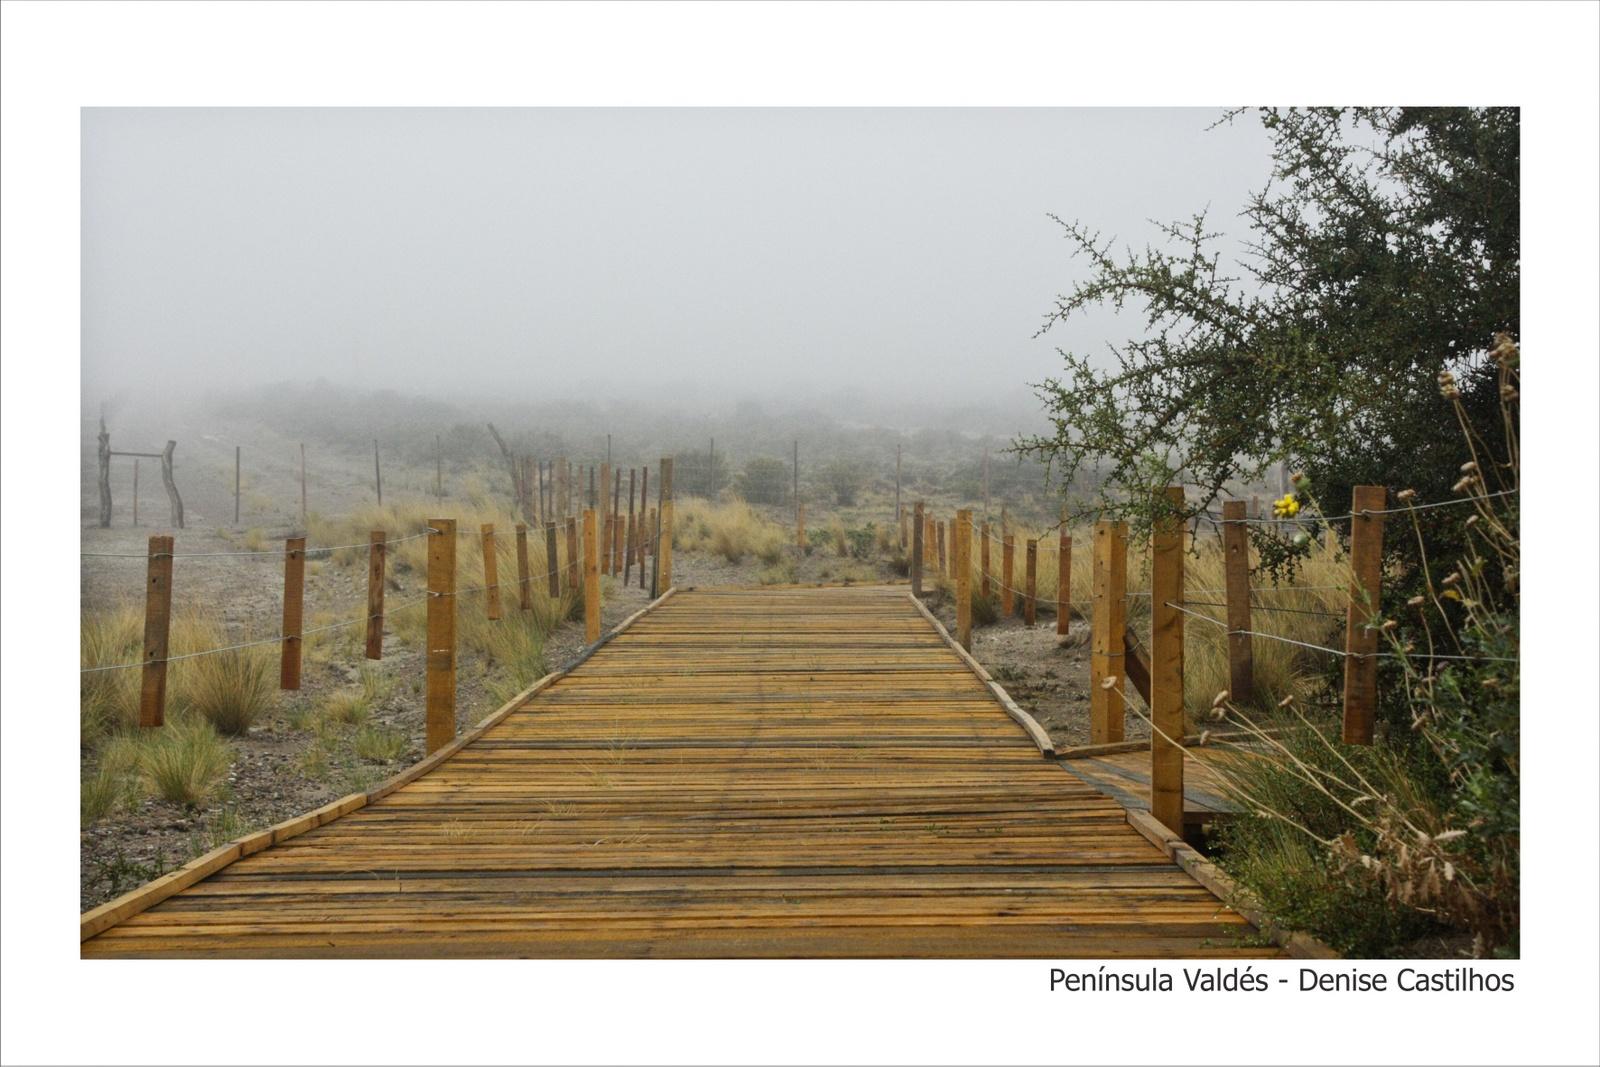 Península_Valdés_-_Denise_Castilhos_-_20-30